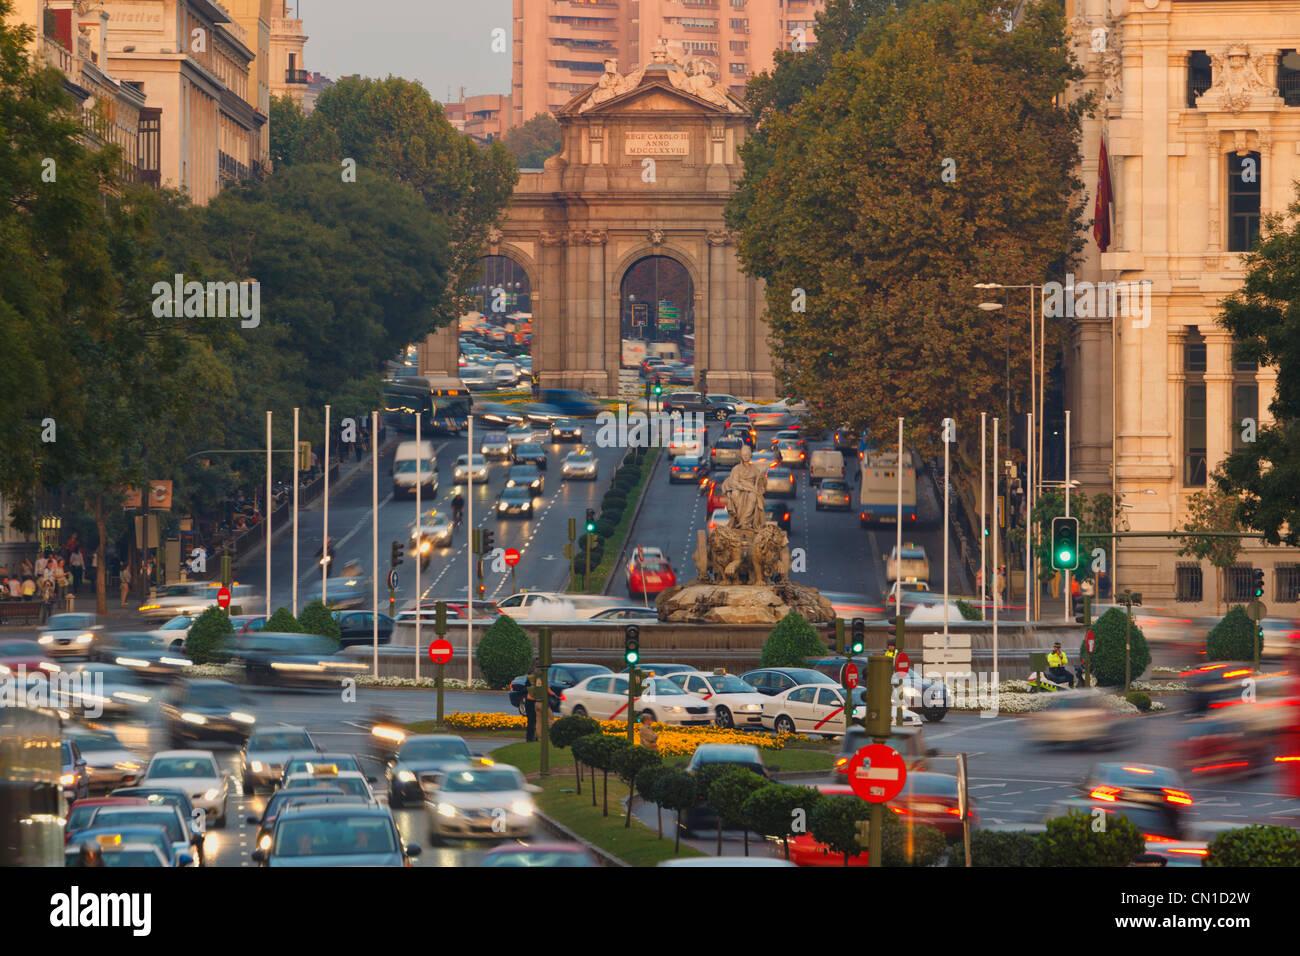 Madrid, Spain. Calle de Alcala. - Stock Image